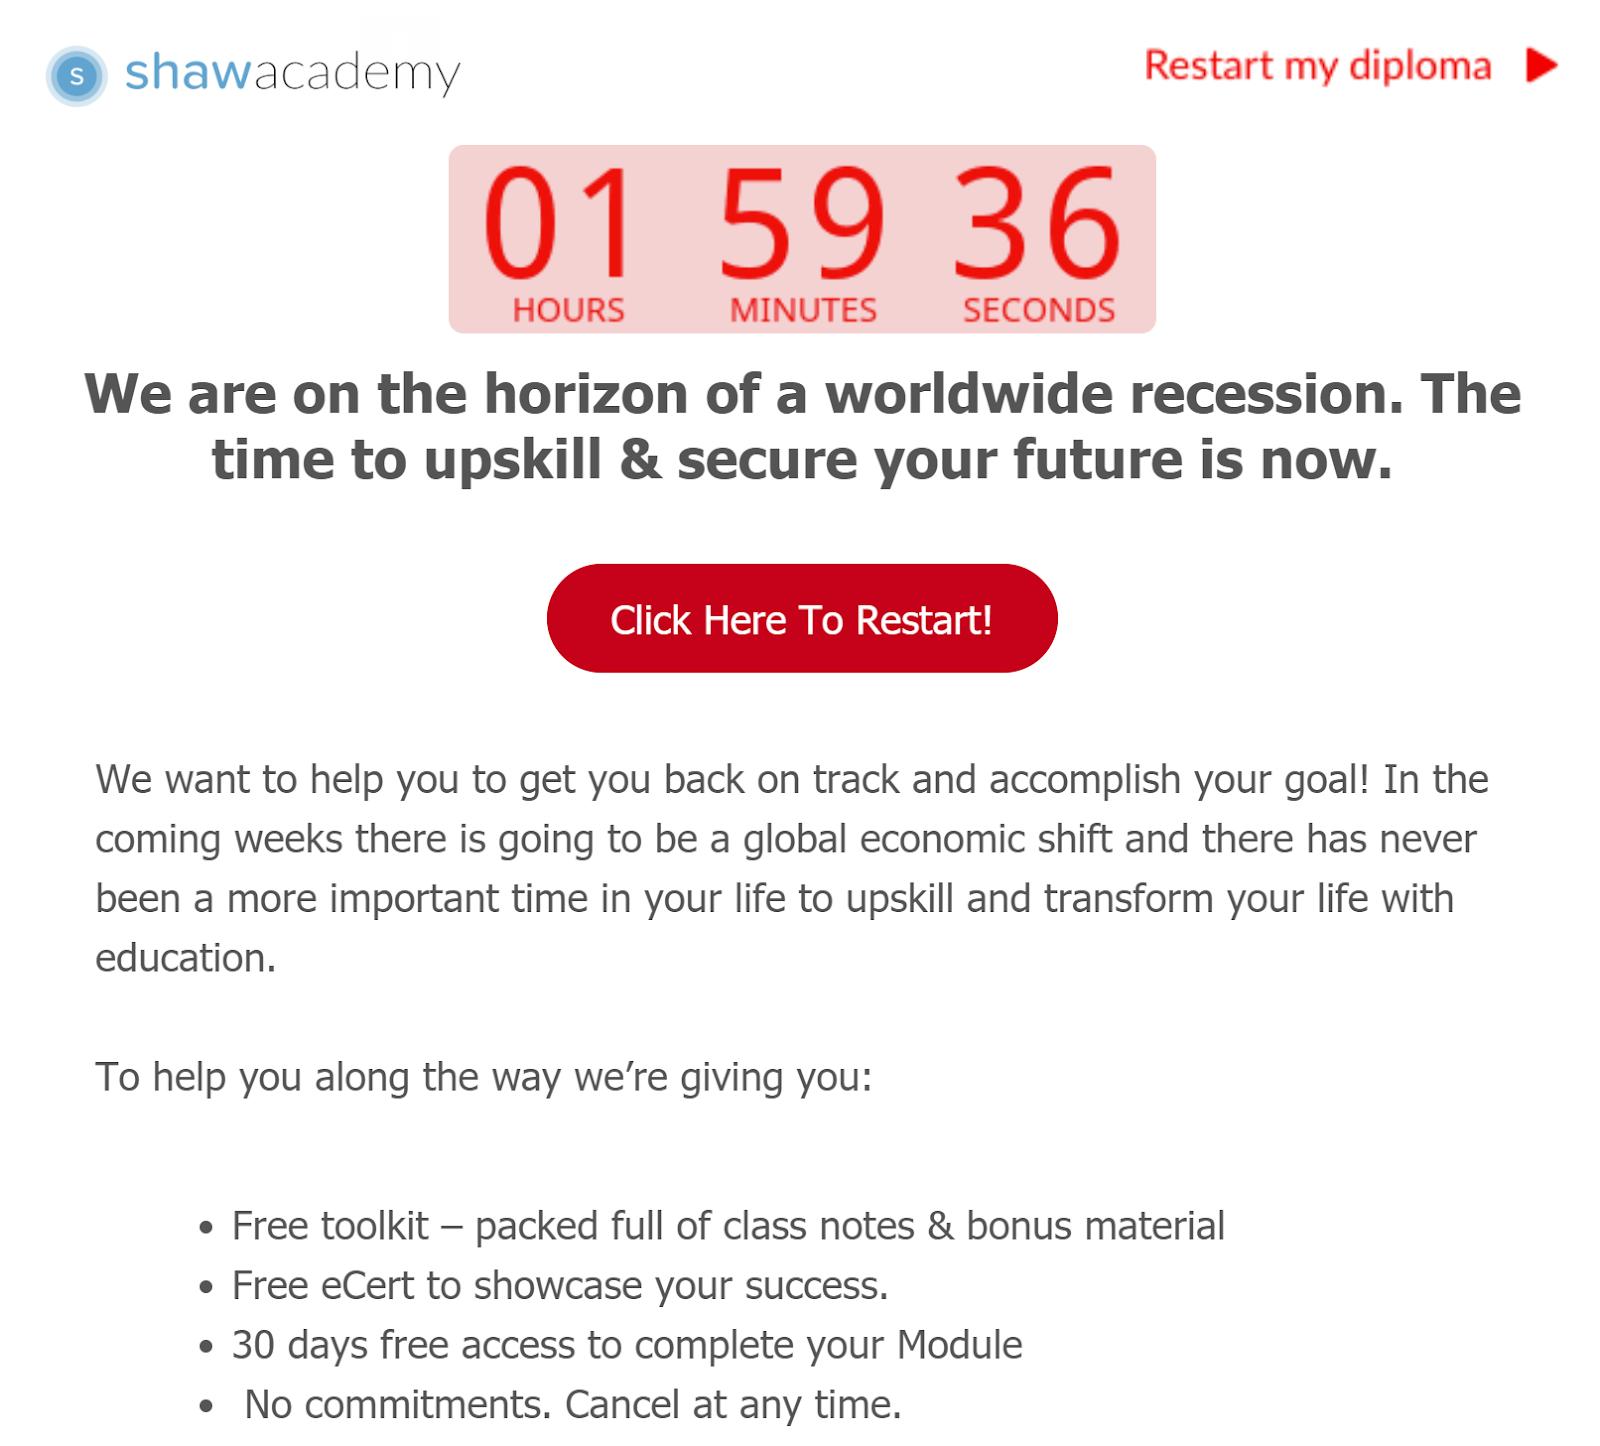 shawacademy urgency email